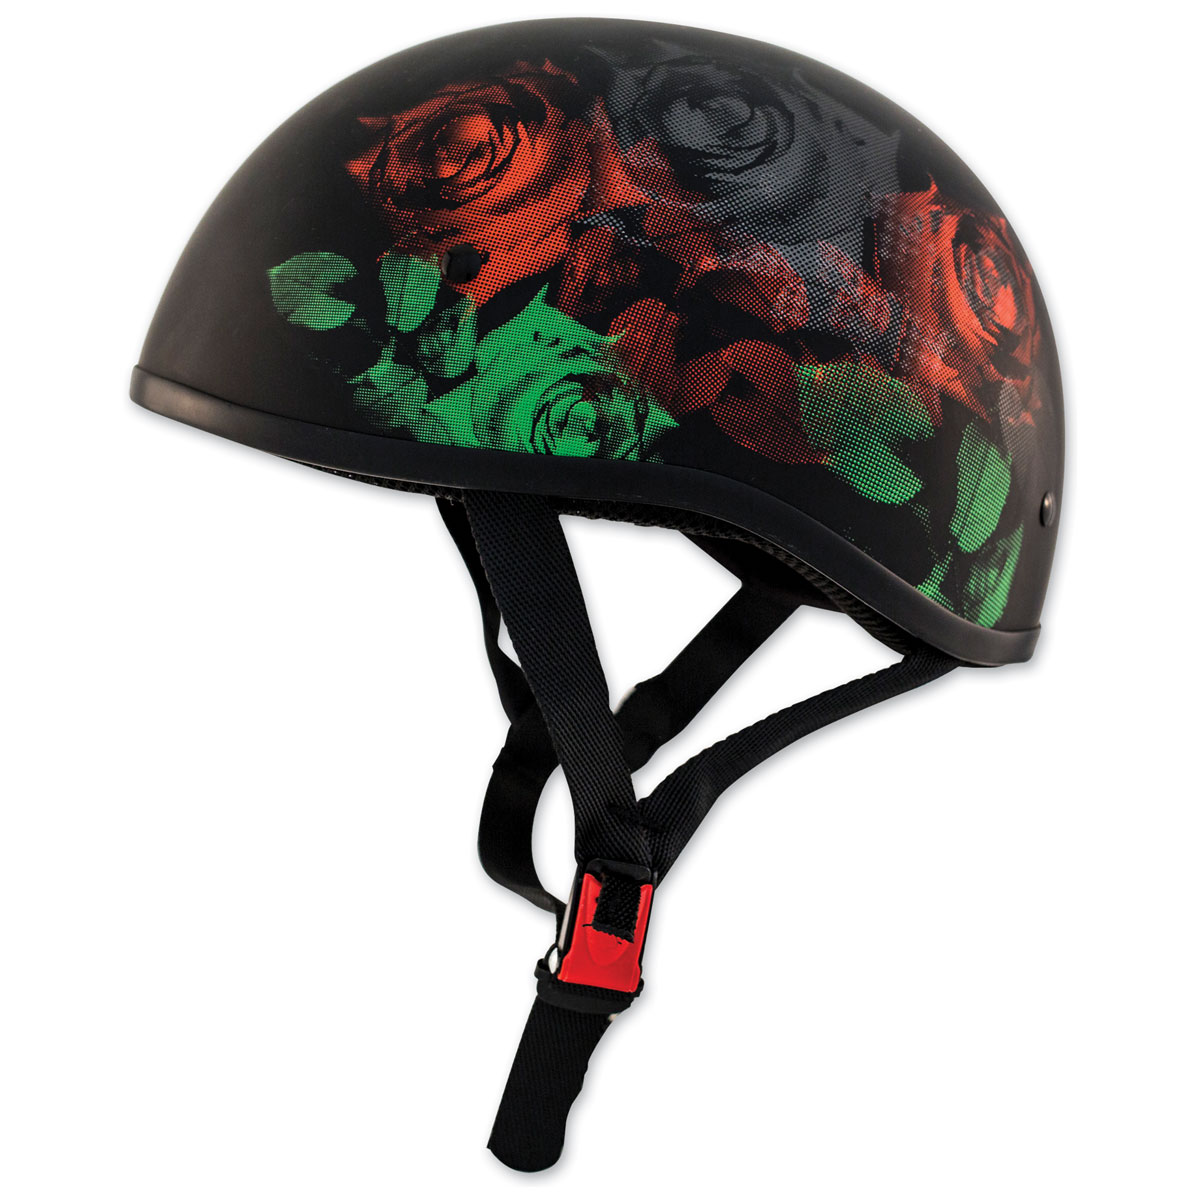 Zox Retro Old School Roses Matte Black Half Helmet